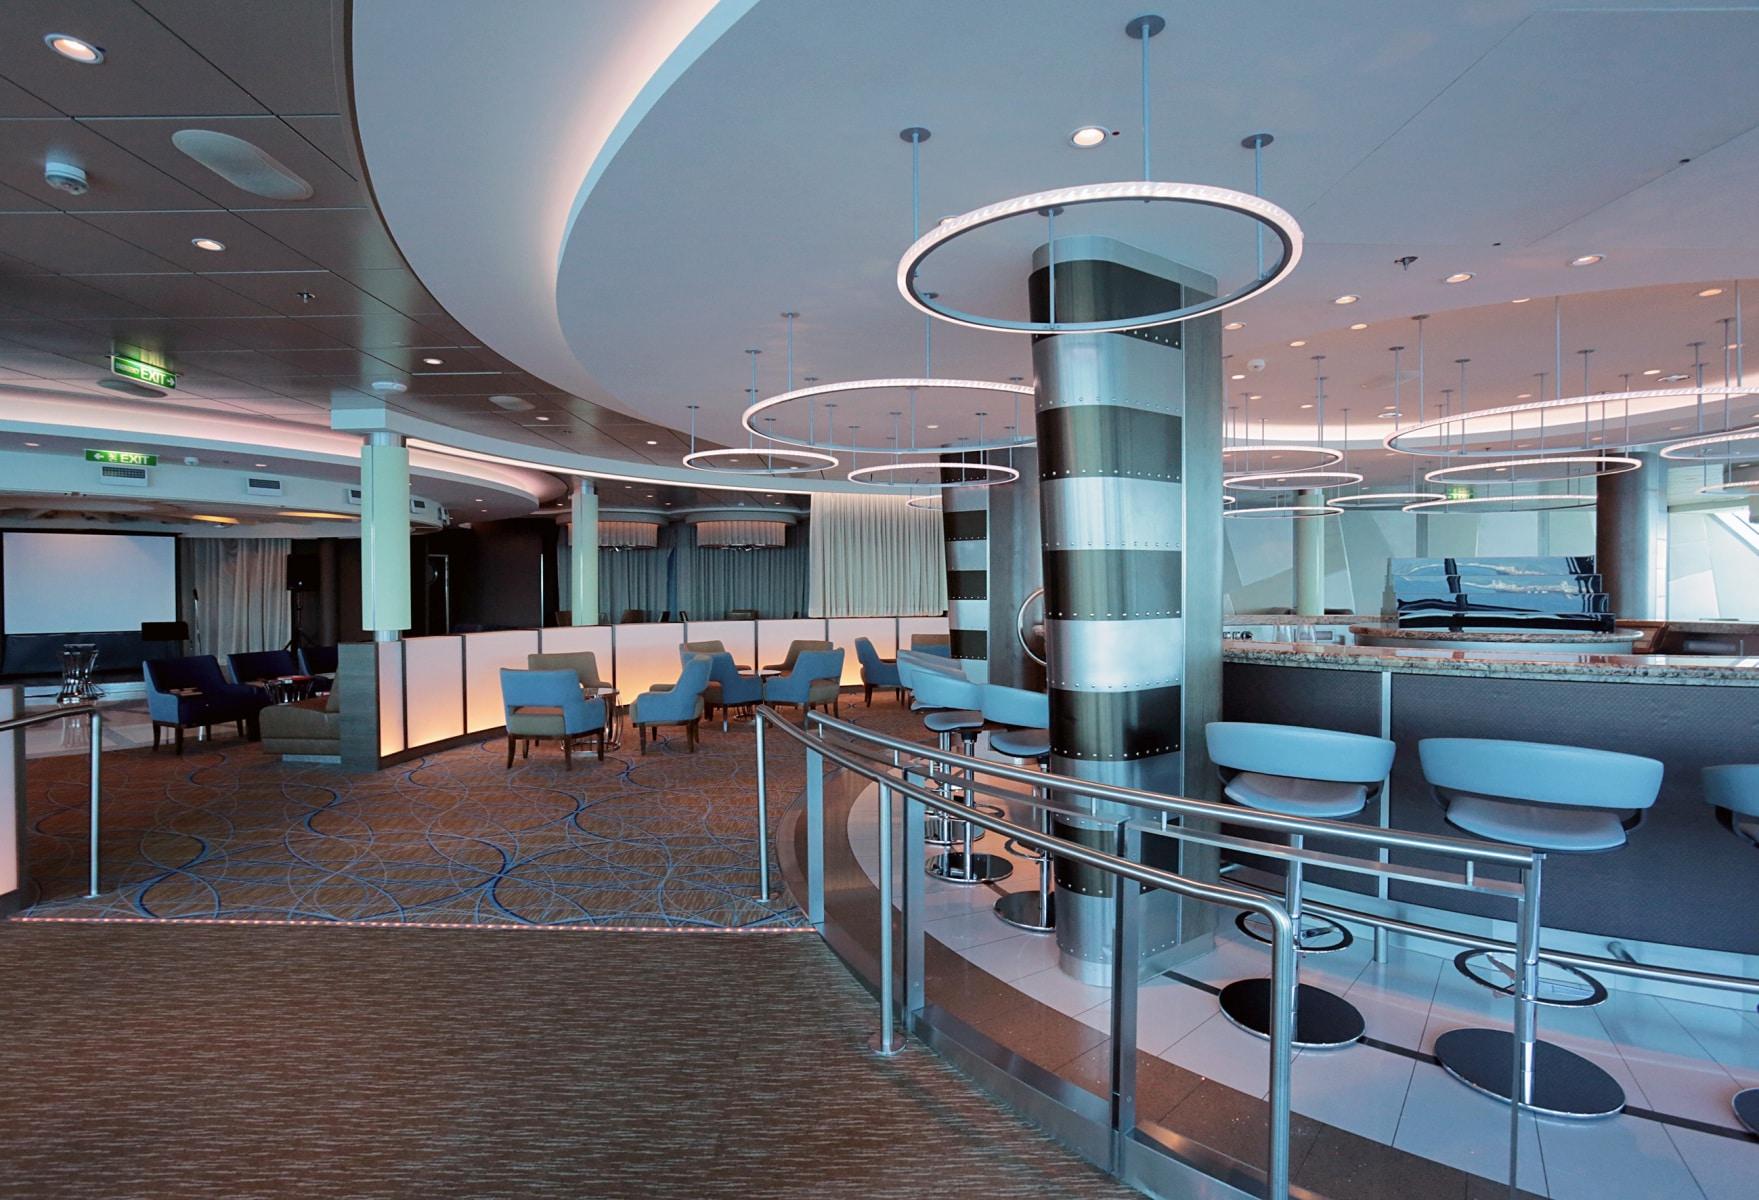 Escala-inaugural-del-crucero-Ovation-of-the-Seas-14